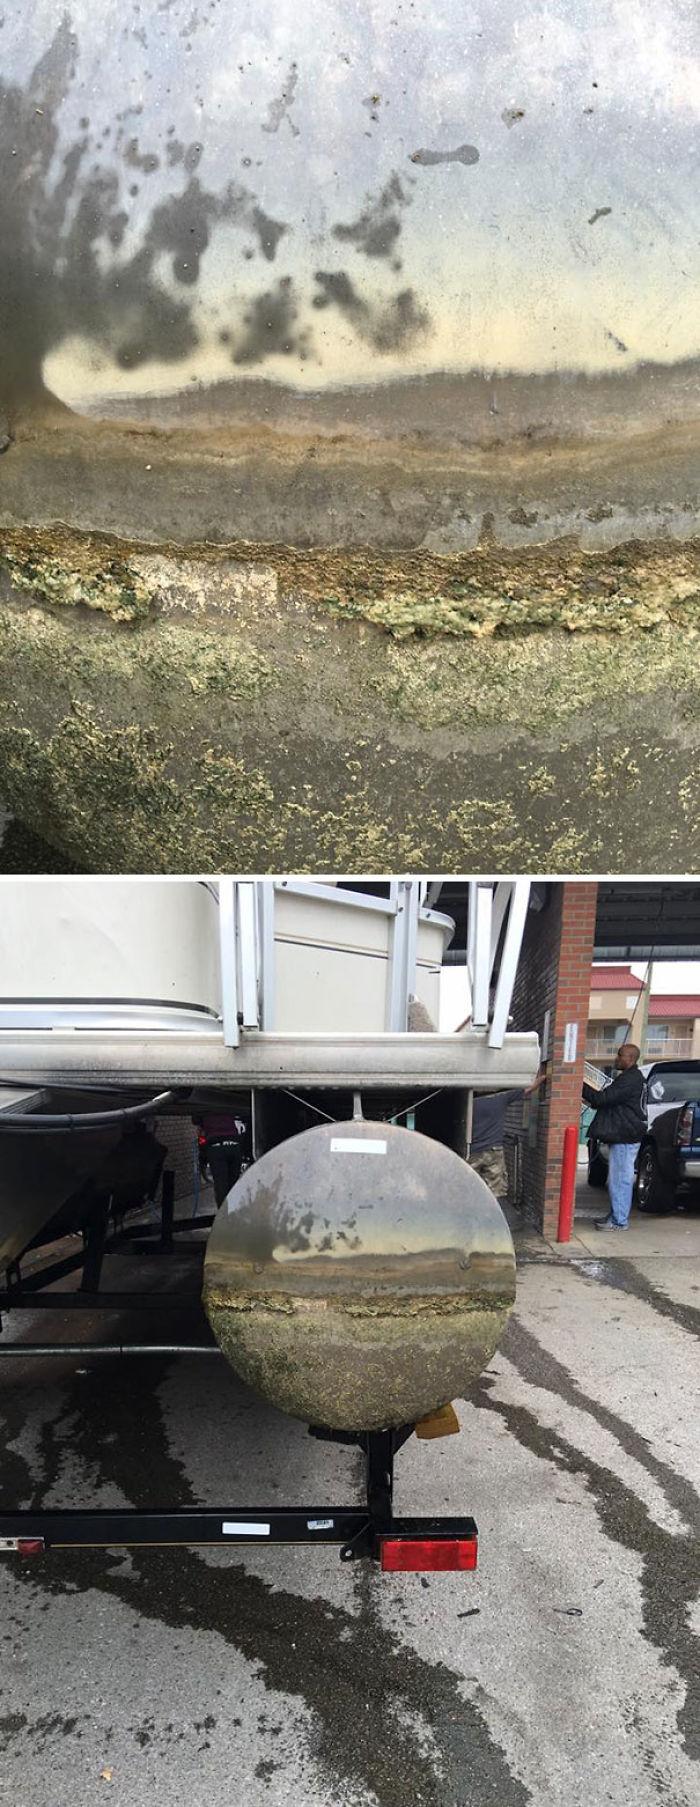 The Algae On My Pontoon Boat Looks Like A Pretty Good Painting